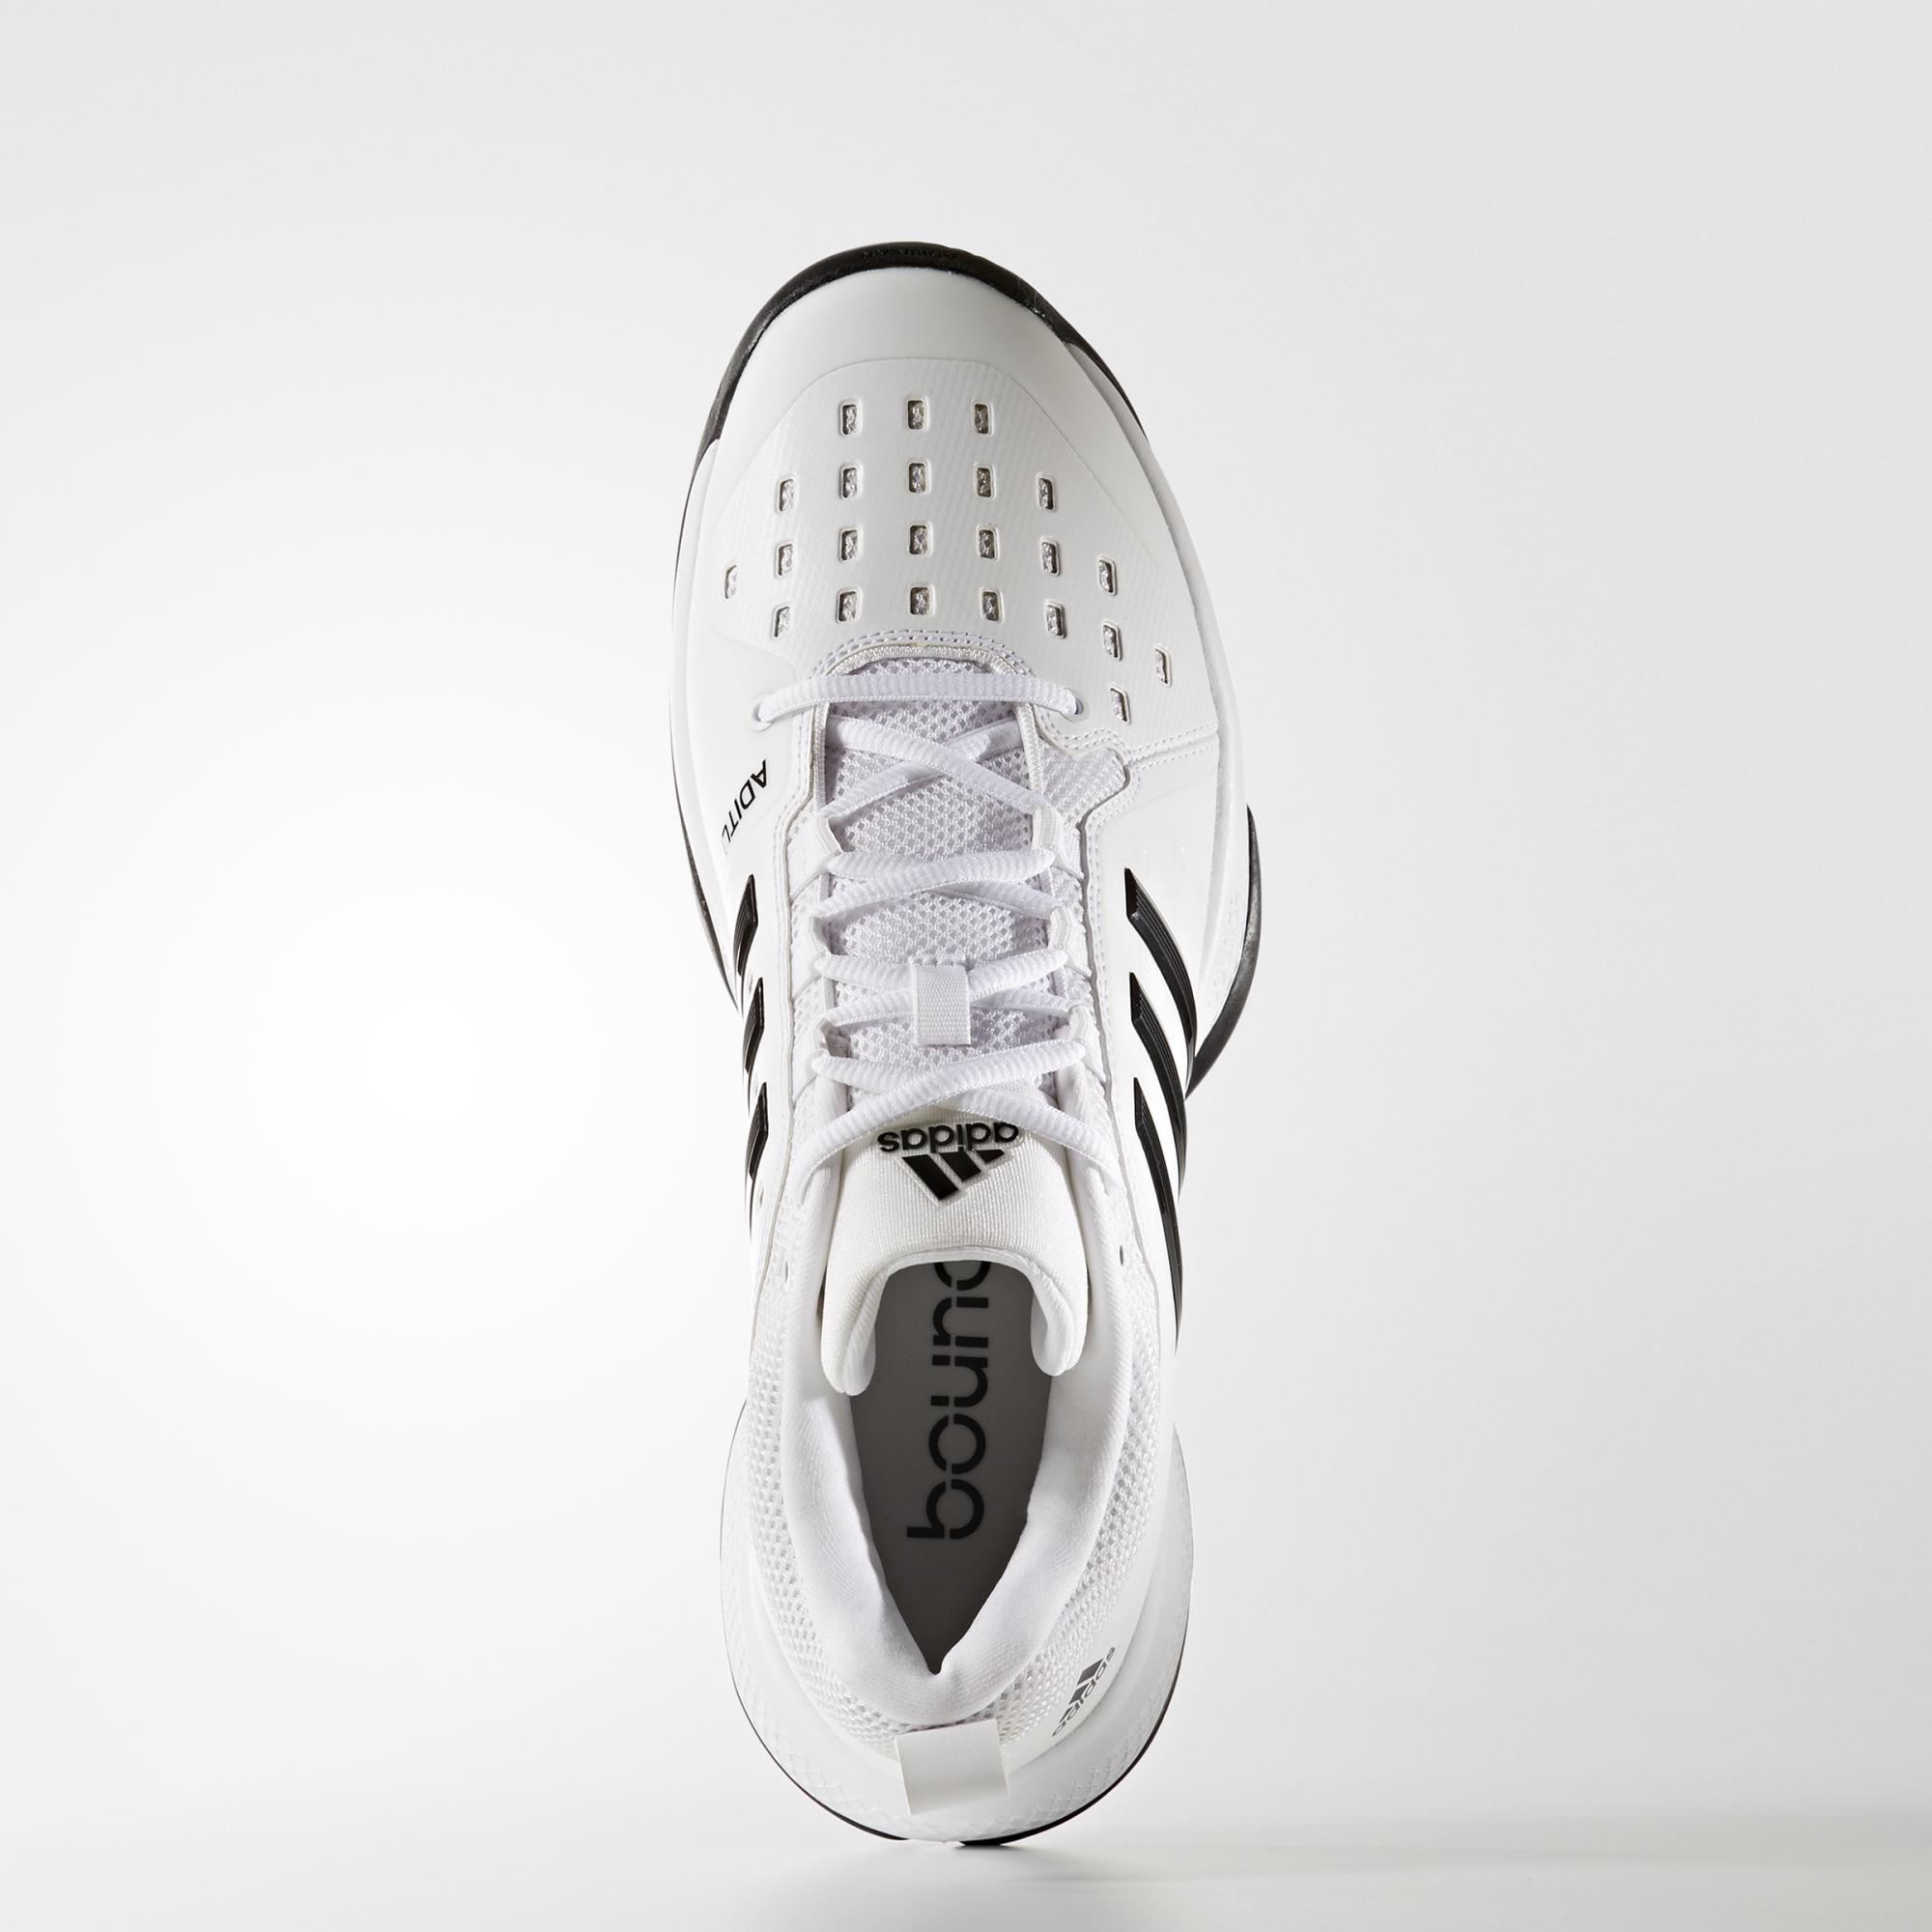 c7624c2837077 Adidas Mens Barricade Classic Bounce Tennis Shoes - White Black ...